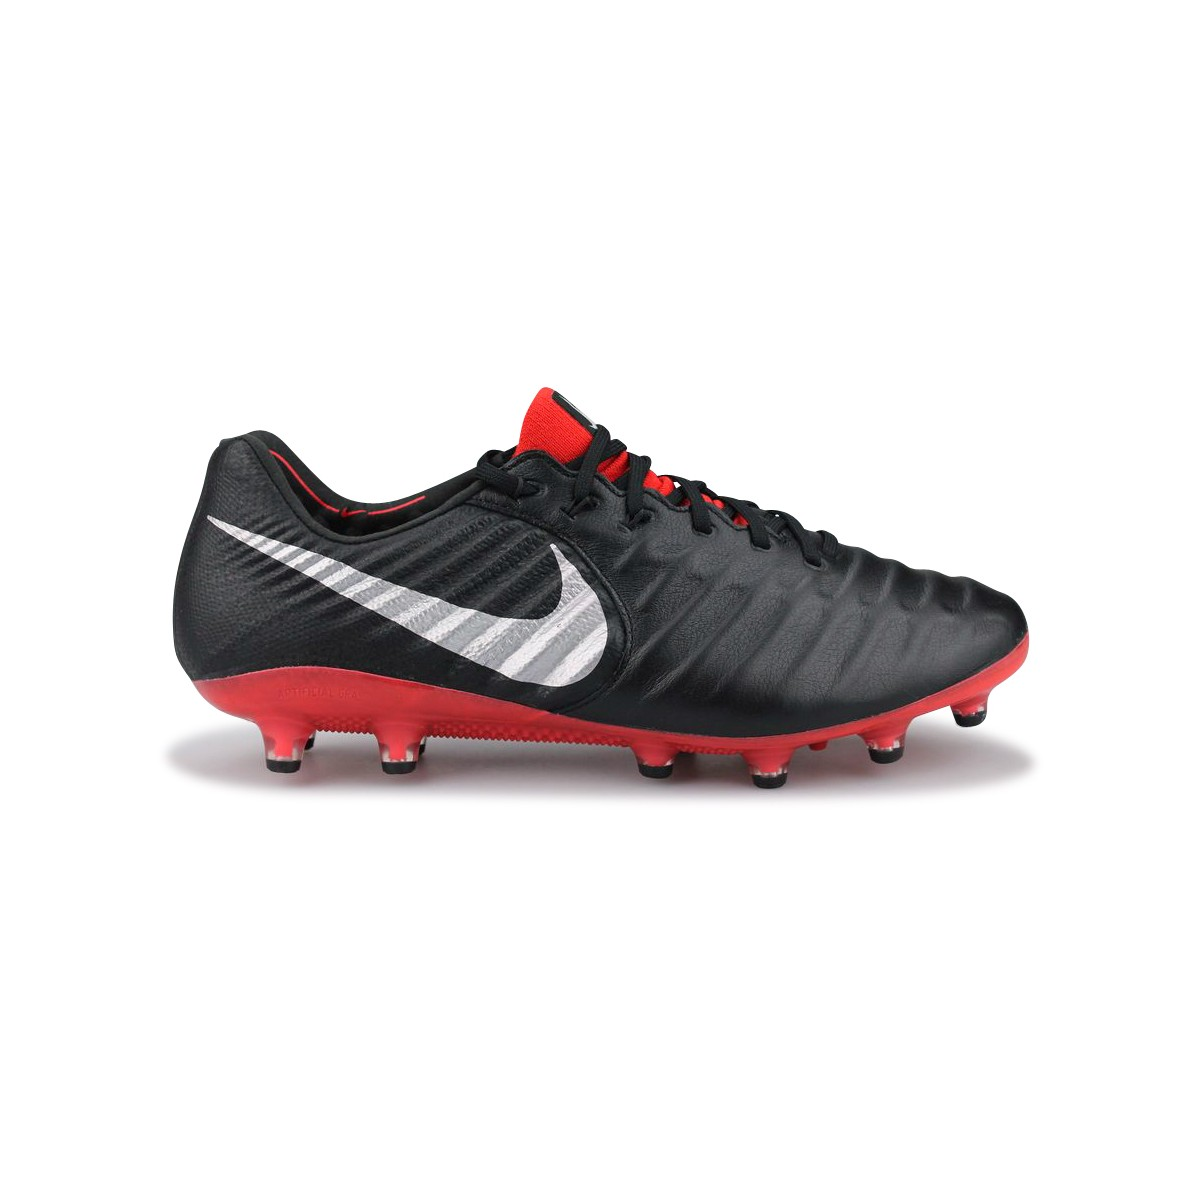 industria gesto Hacia  Nike Tiempo Legend 7 Elite Ag Pro Noir - Street Shoes Addict